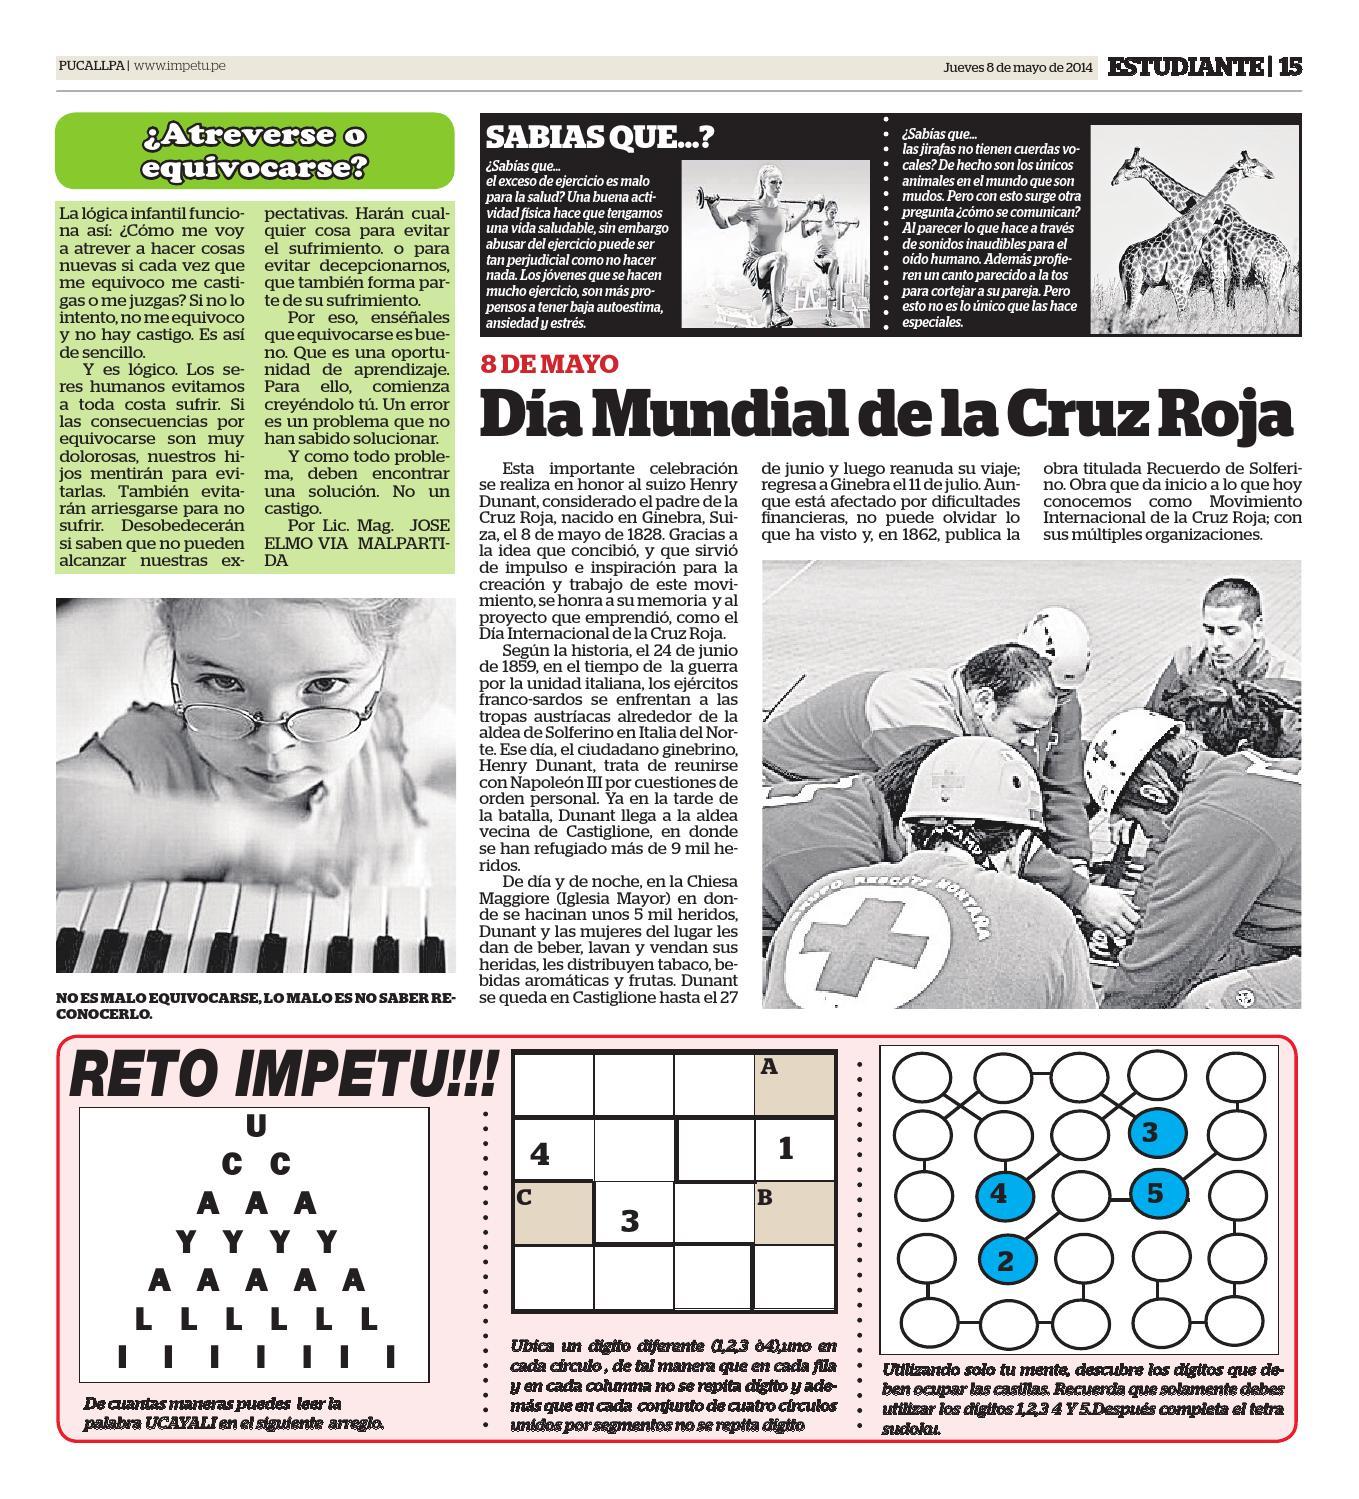 Impetu 08 de mayo de 2014 by Diario Ímpetu - issuu